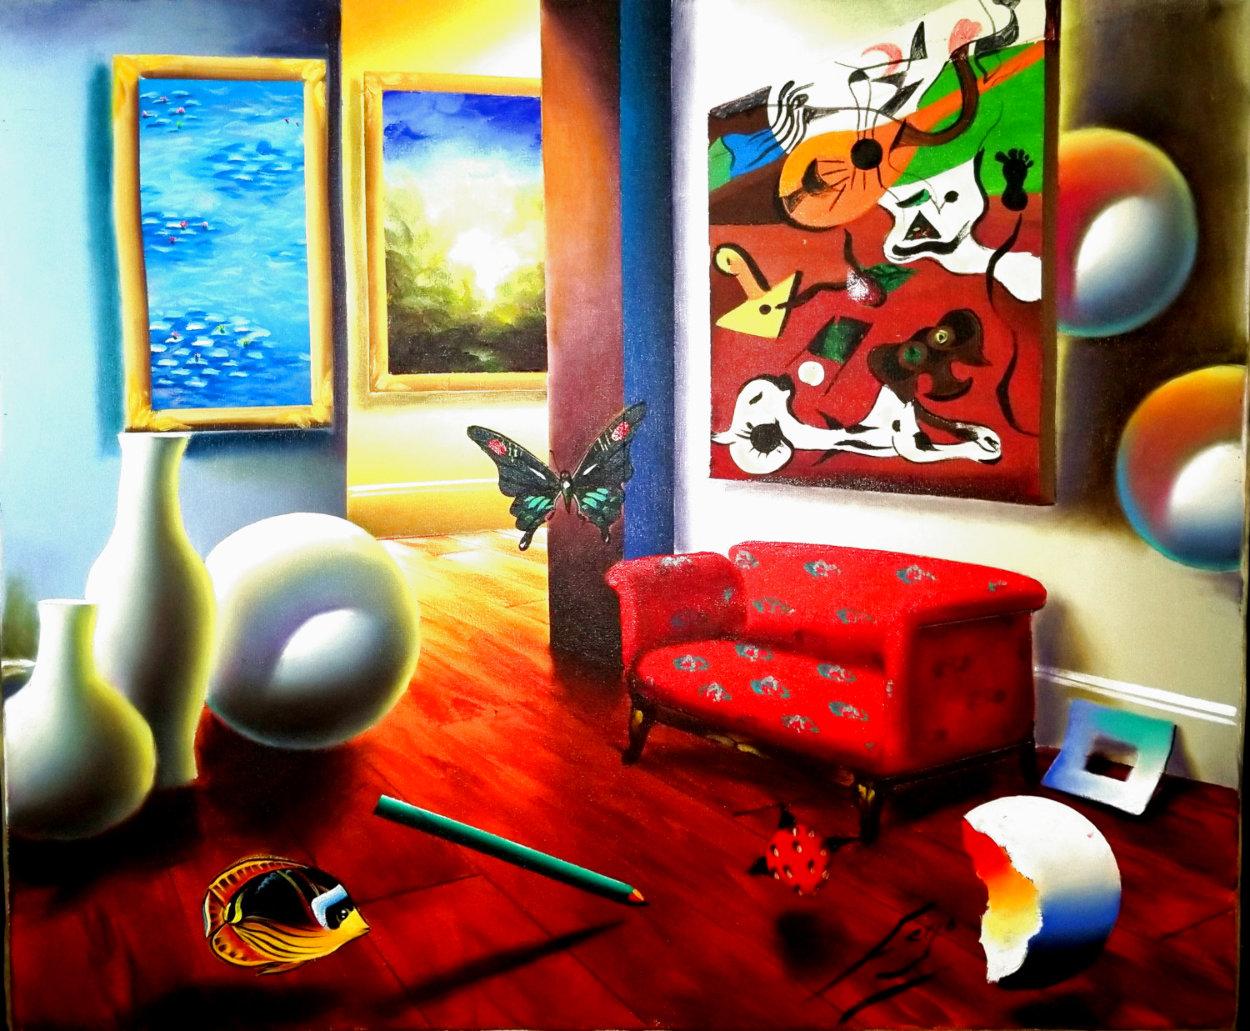 Untitled Interior Painting 22x26 Original Painting by (Fernando de Jesus Oliviera) Ferjo